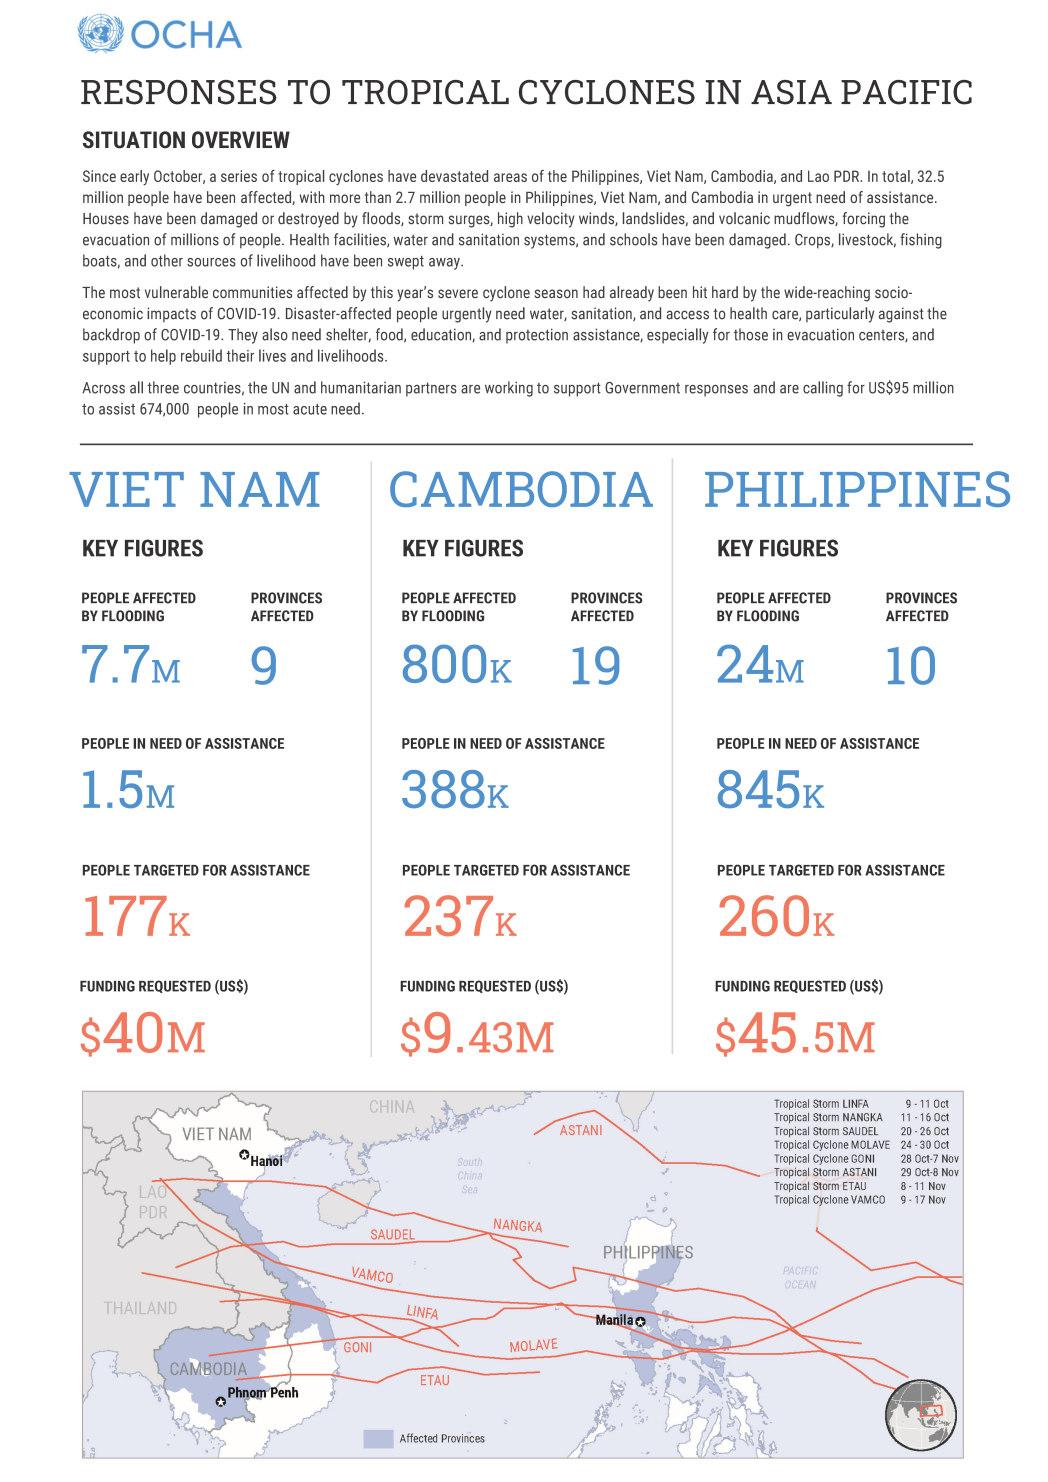 Typhoons Cyclones Floods Asia Pacific Humanitarian Responses Philippines Vietnam Cambodia LaoPDR OCHA 13Nov2020